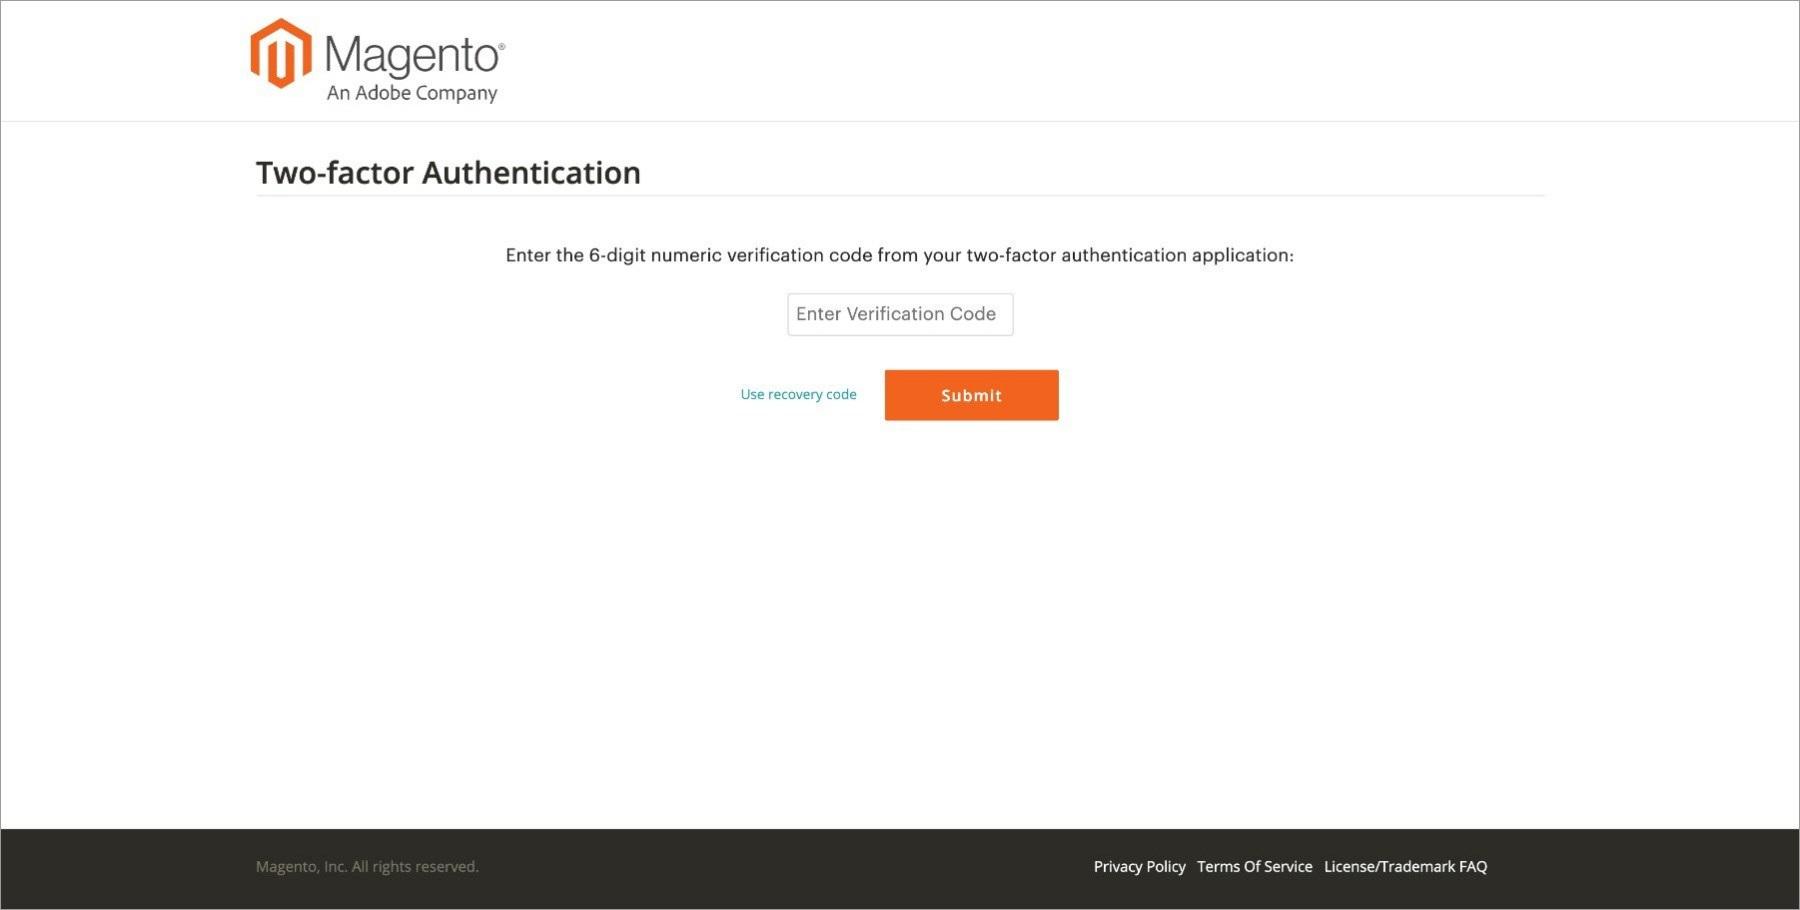 تأمين حساب ماجنتو الخاص بك - Securing Your Magento Account